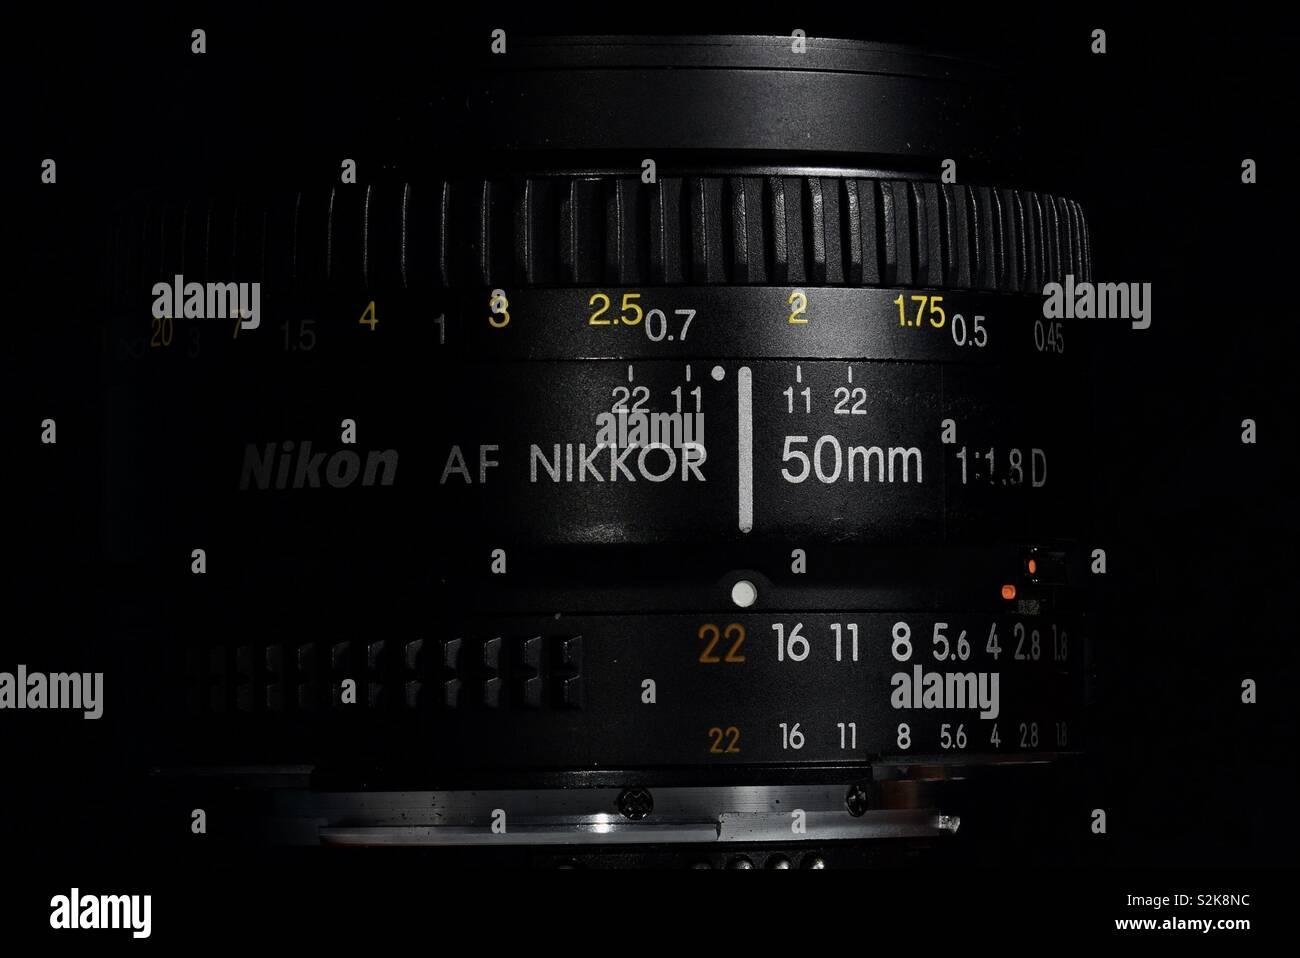 Nikkor 50mm Nikon lens - Stock Image